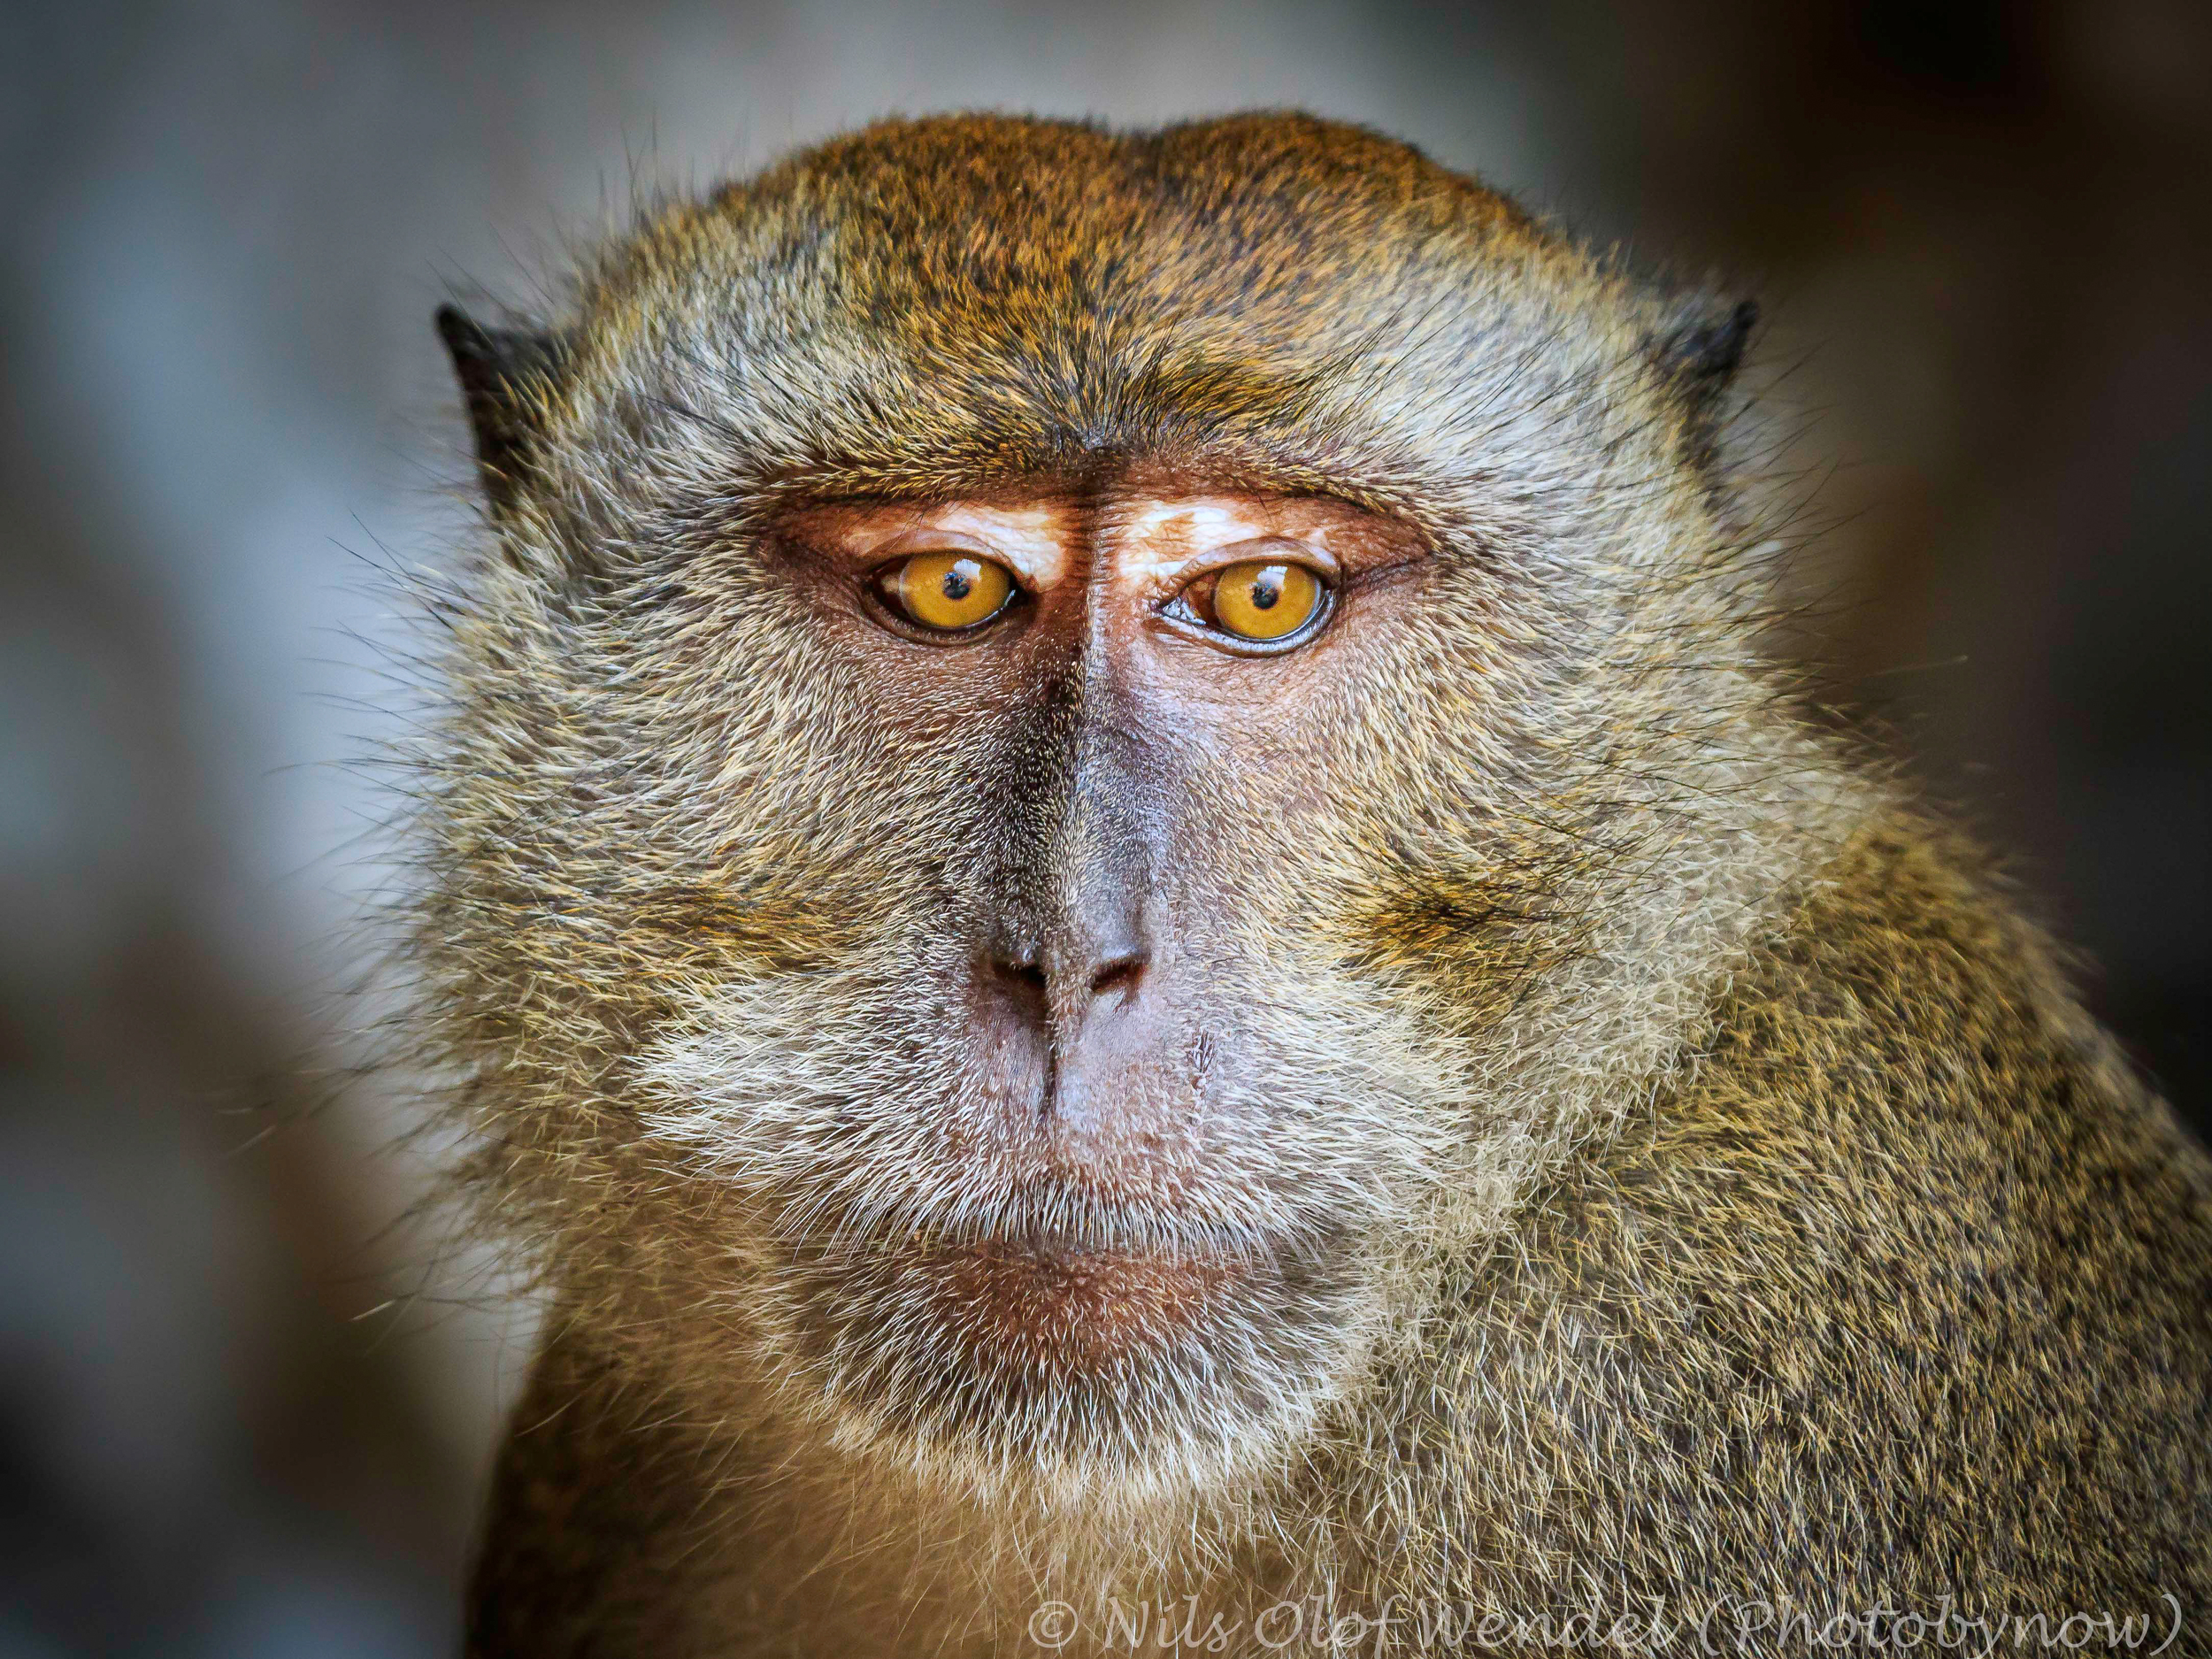 An Macaque monkey.